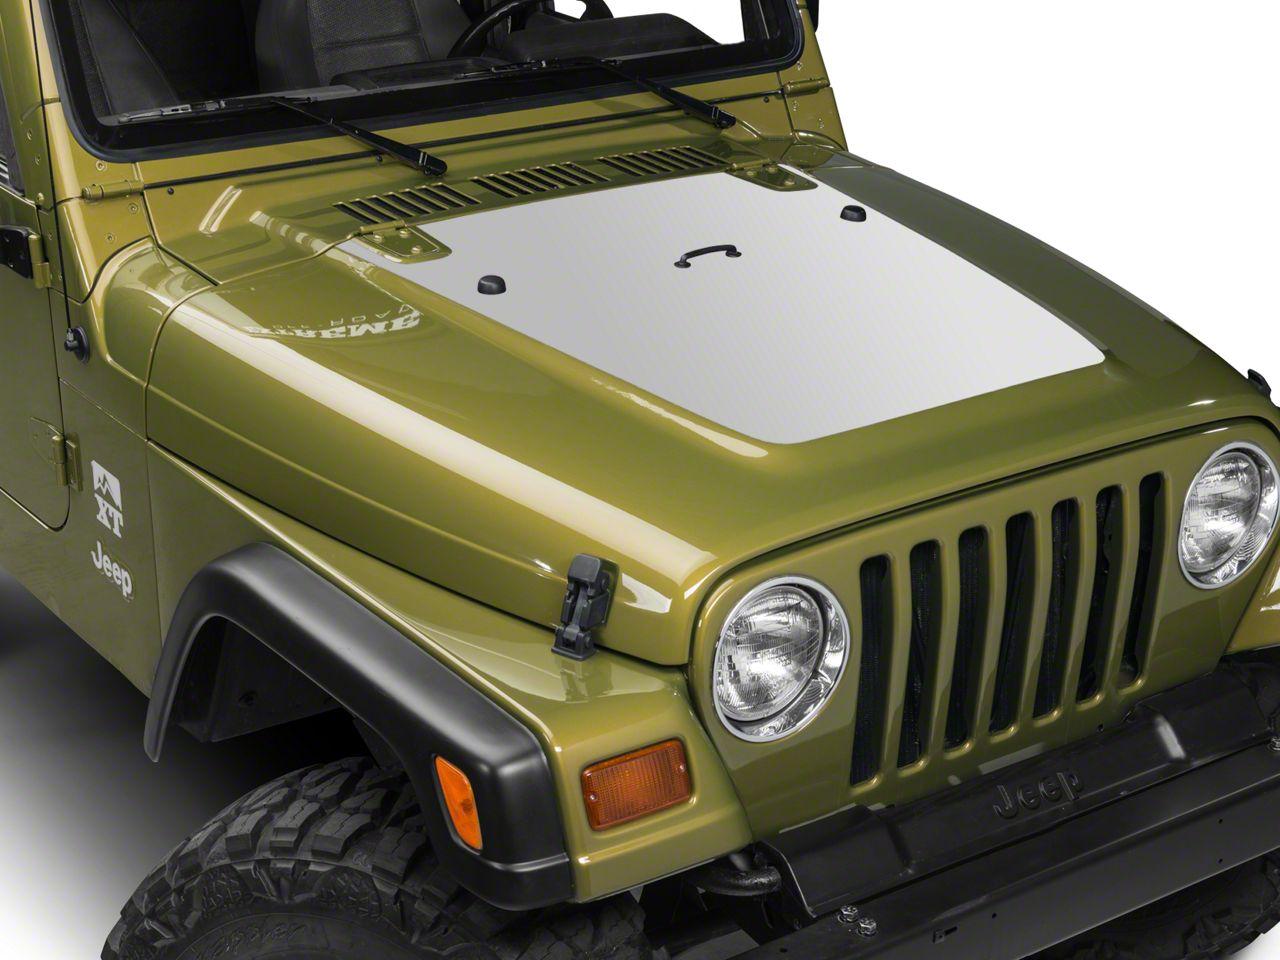 XT Graphics Hood Decal - Silver (97-06 Jeep Wrangler TJ)